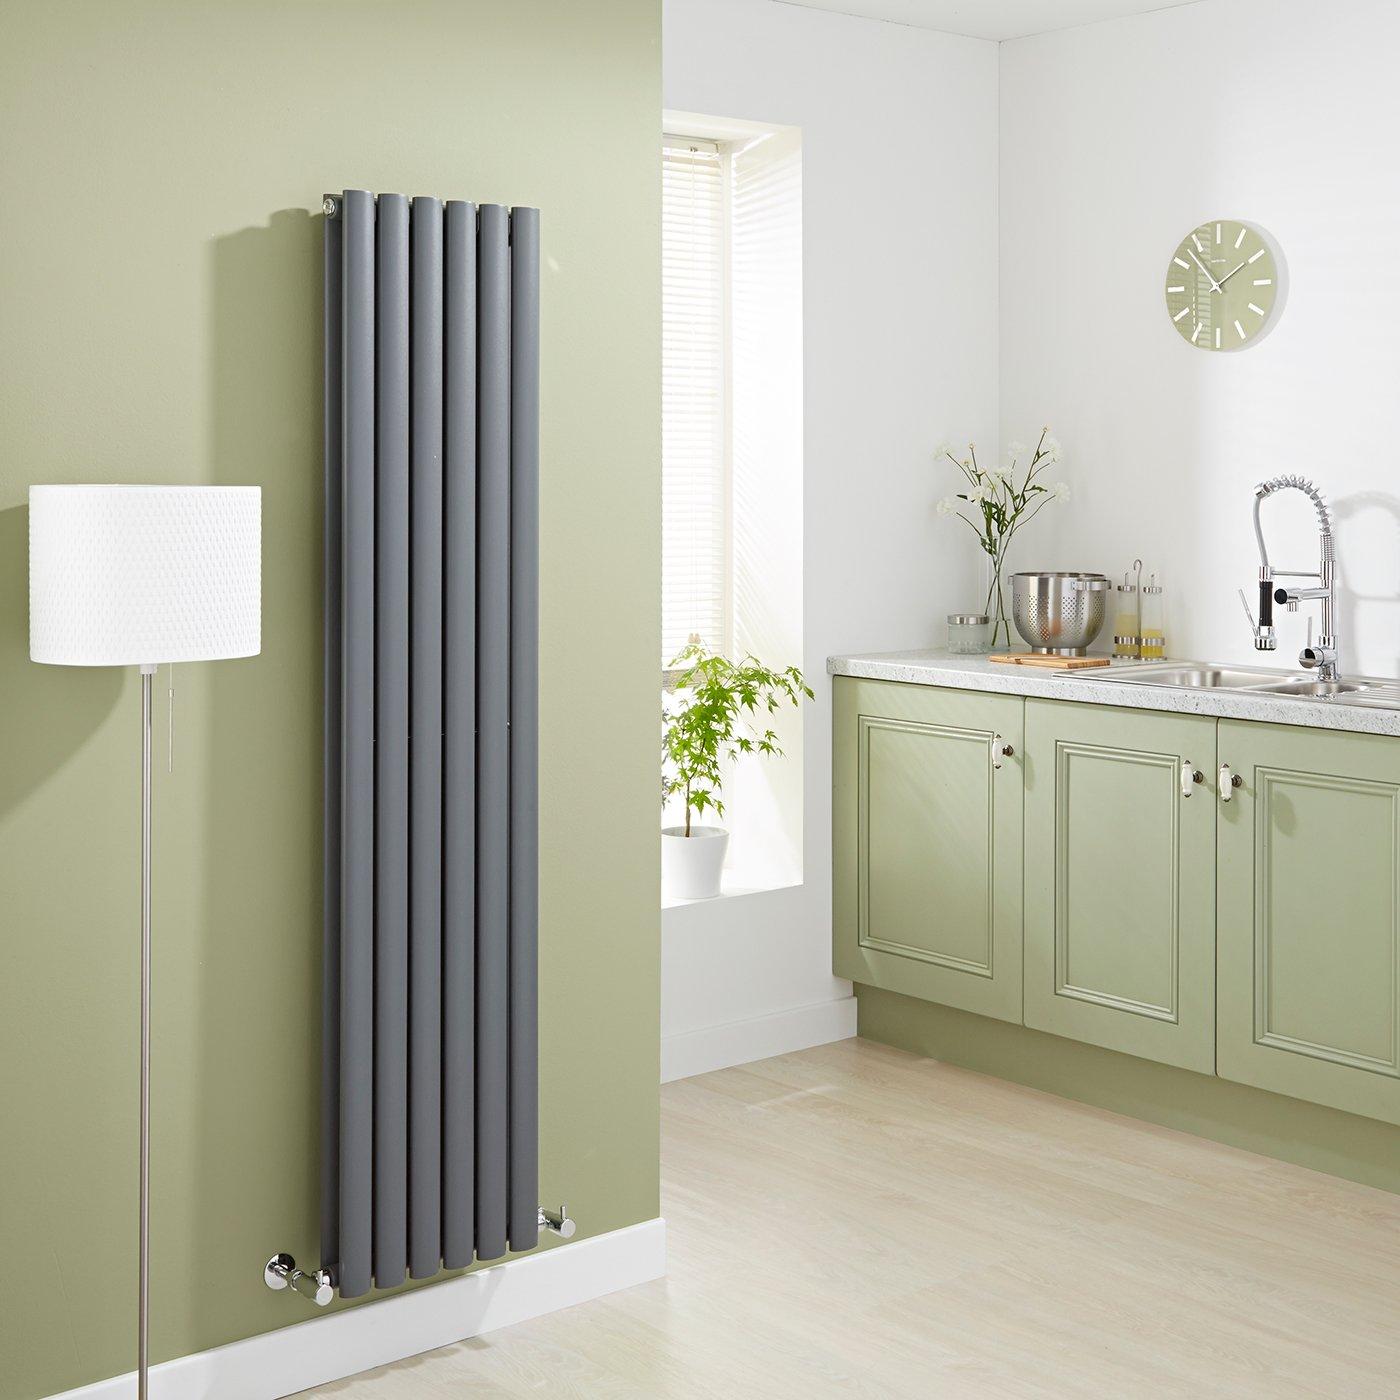 exceptionnel radiateur chauffage central renaa conception. Black Bedroom Furniture Sets. Home Design Ideas